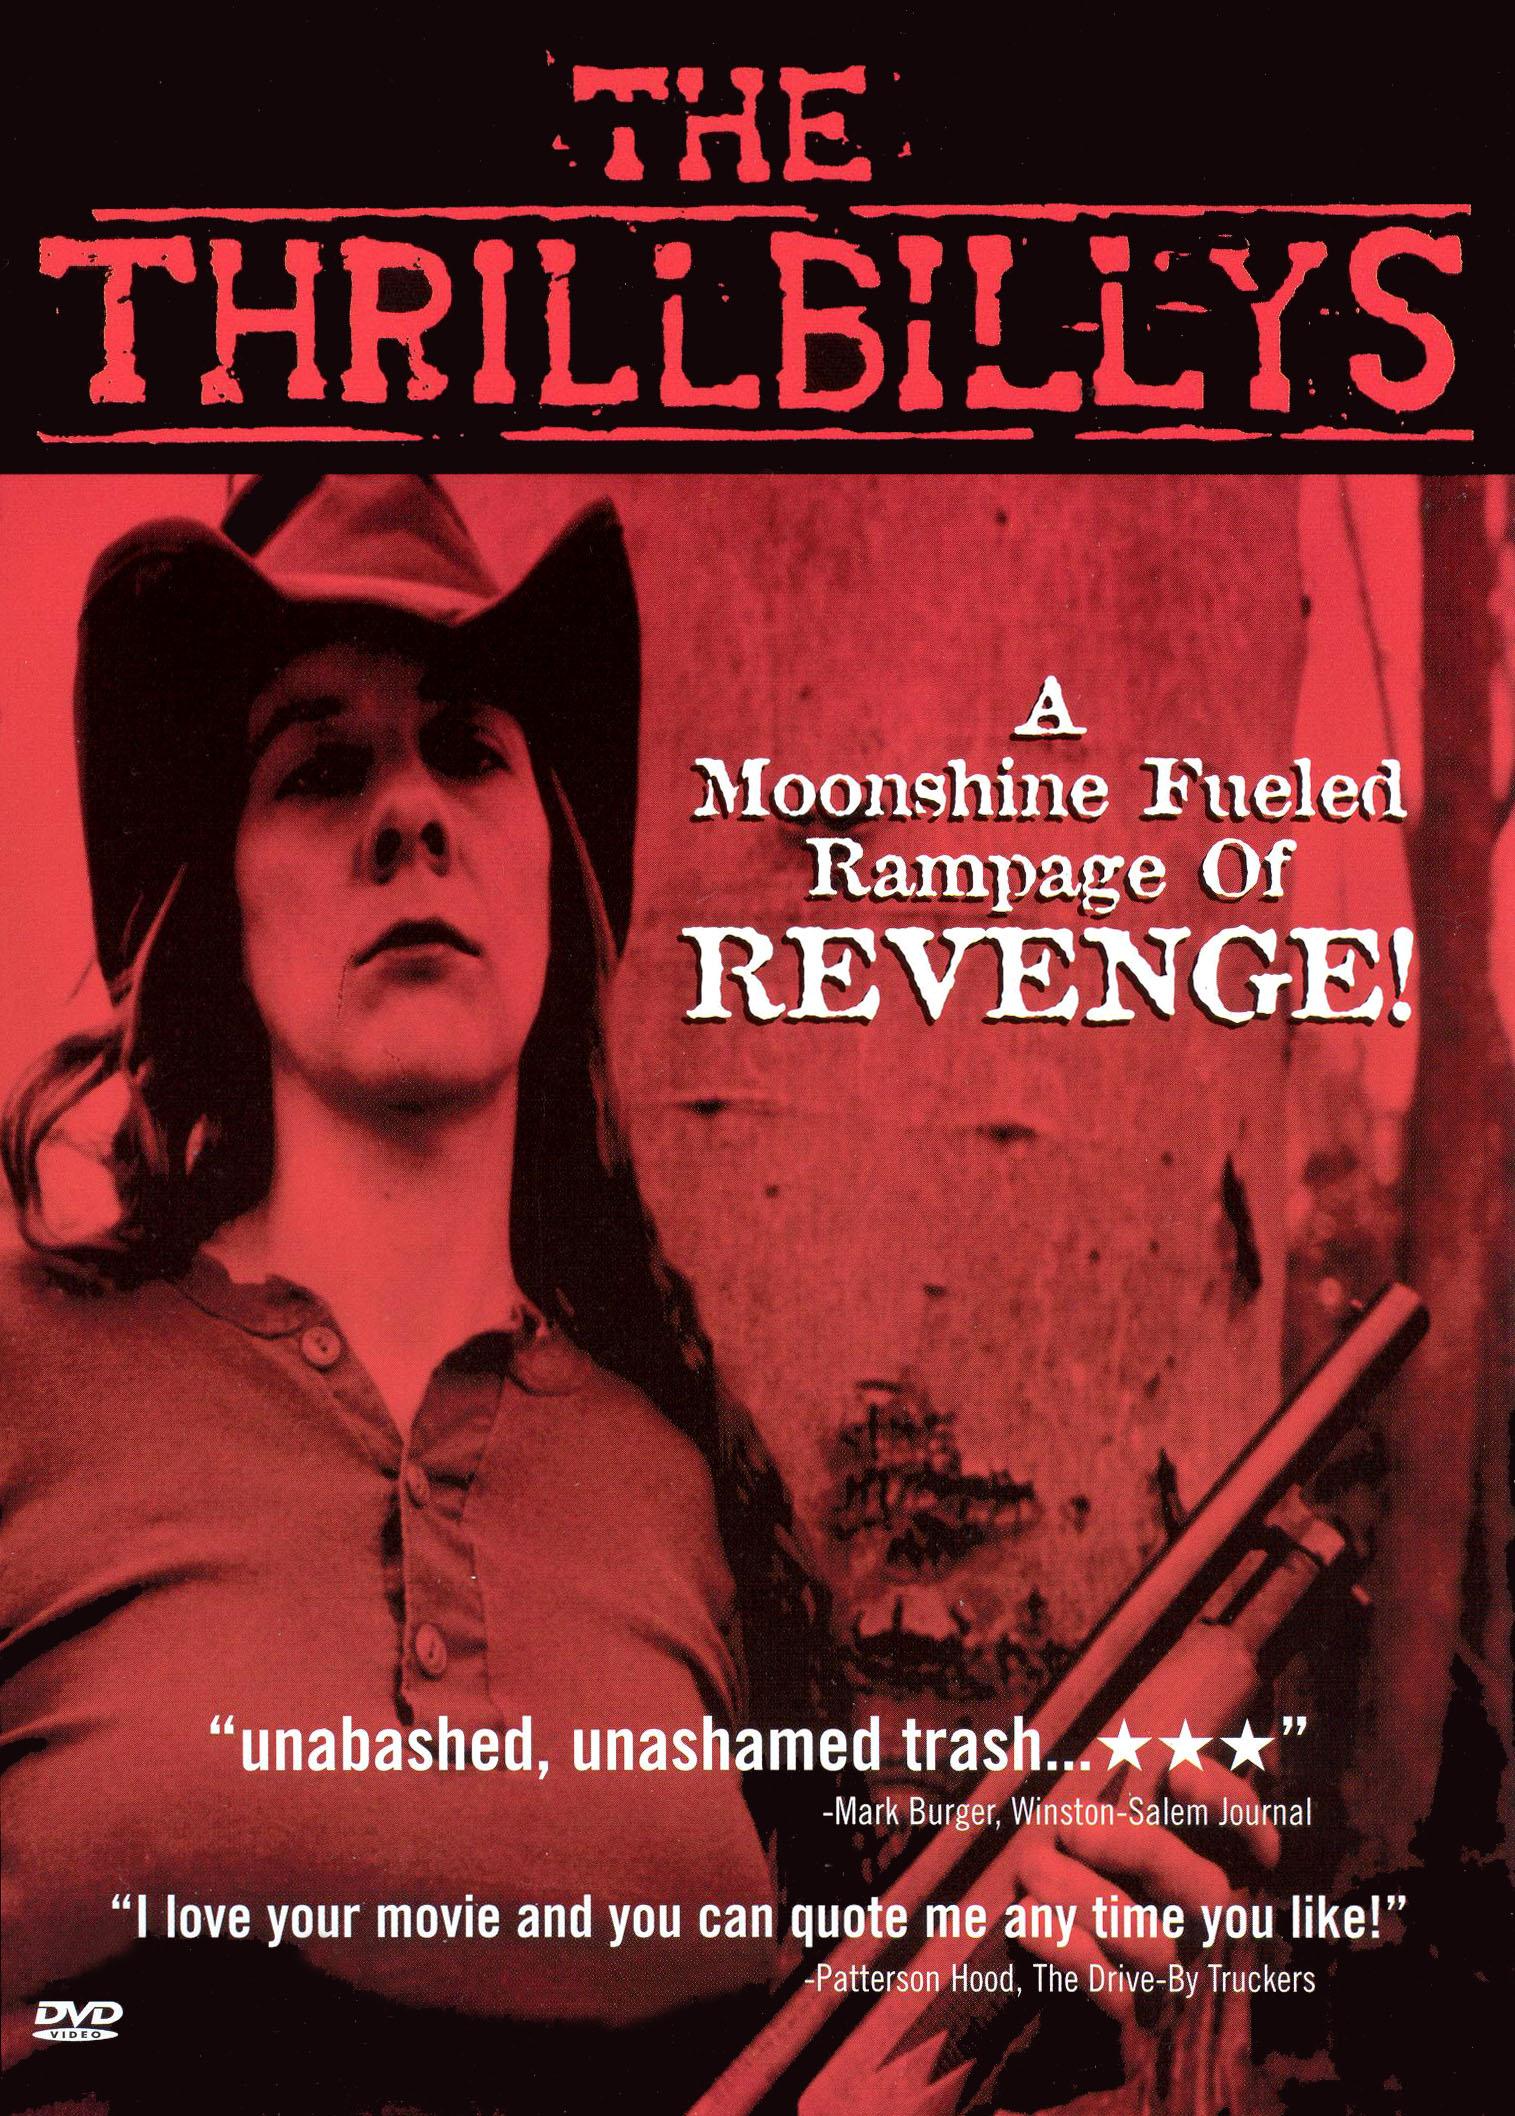 The Thrillbillys